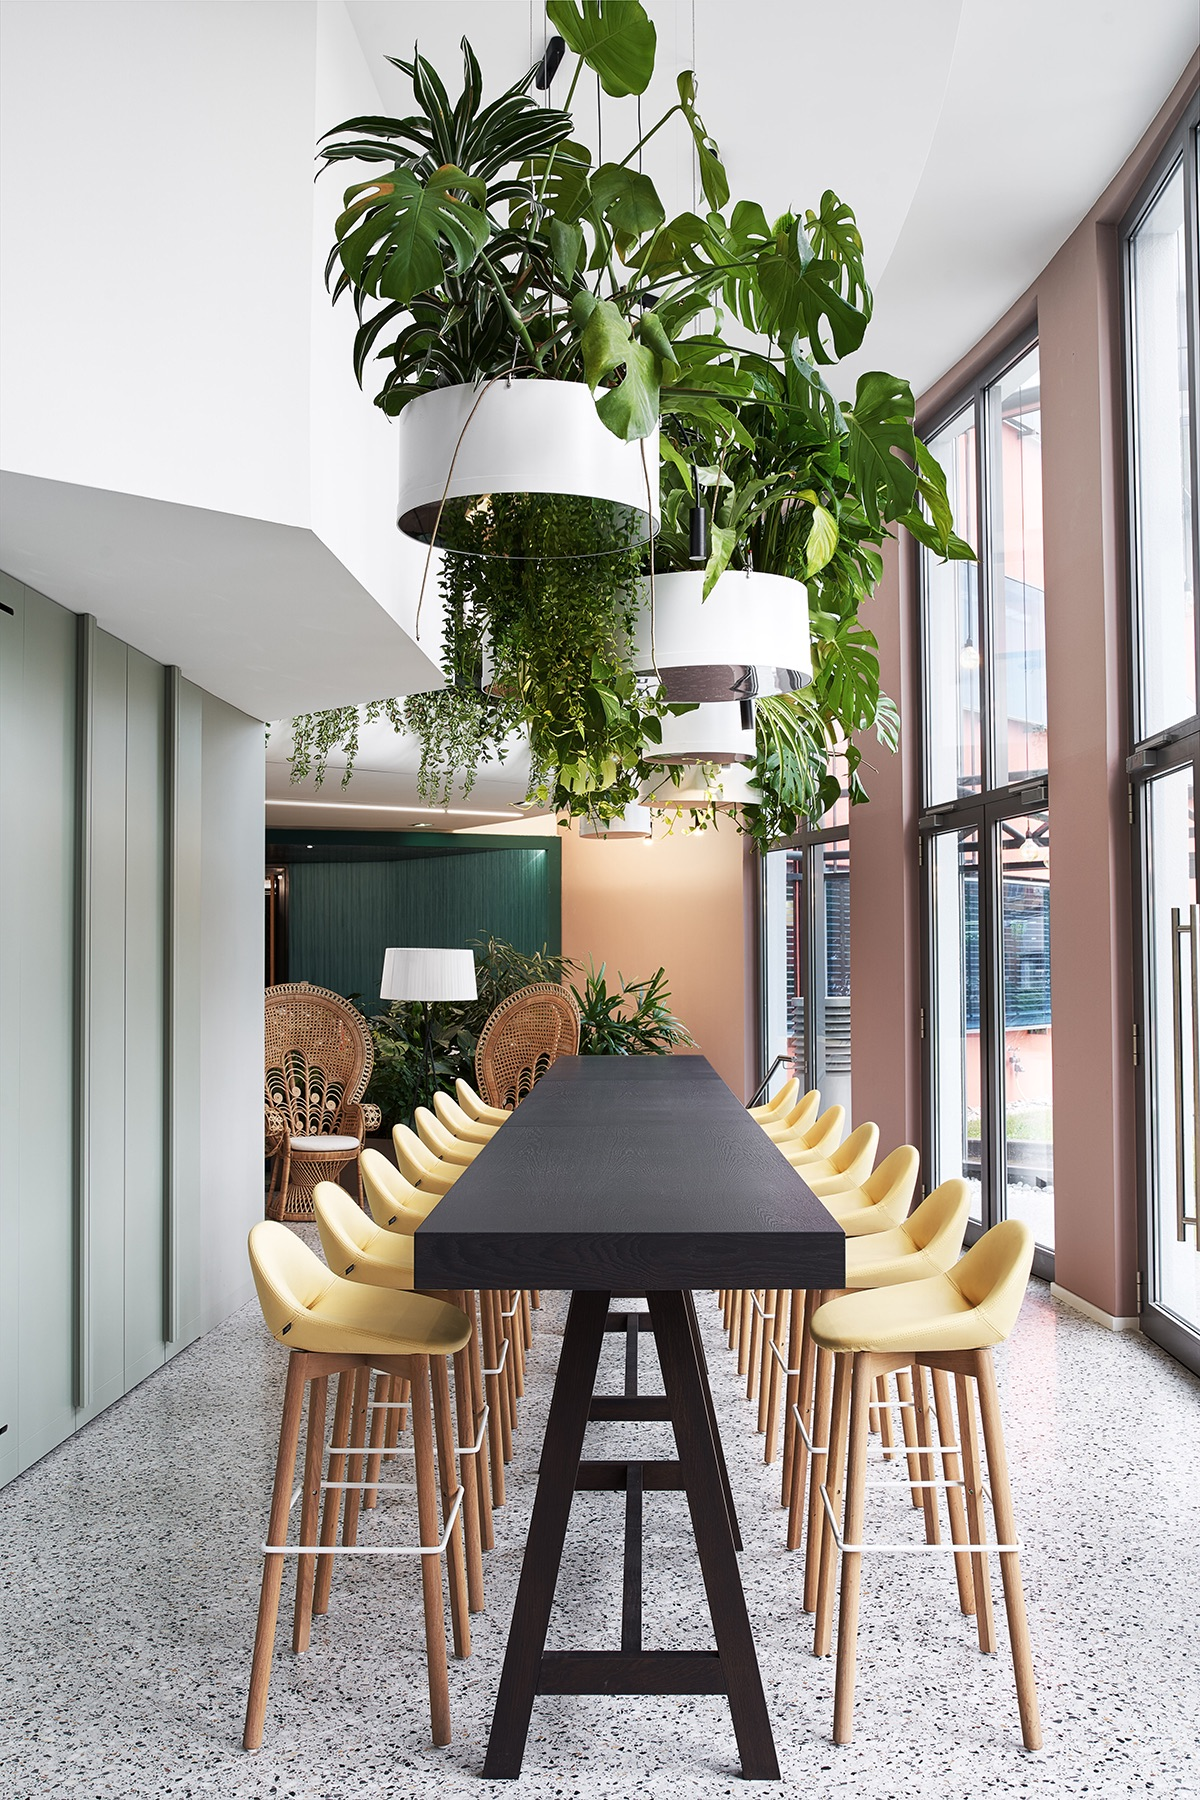 roman-klis-design-office-13